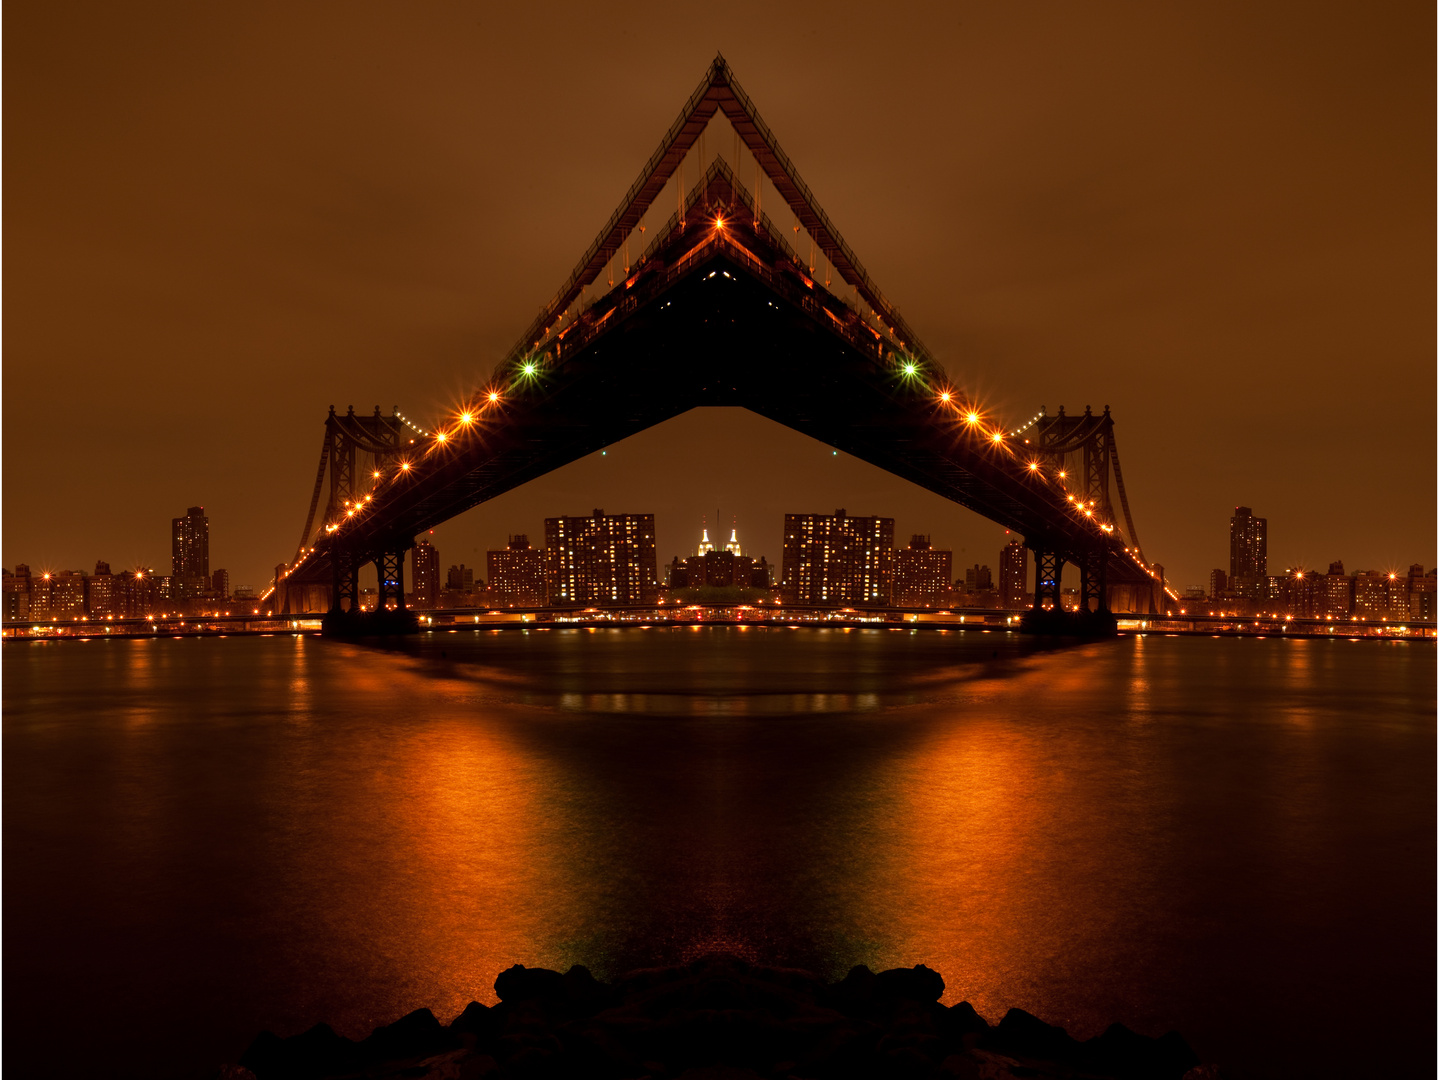 Played with the Manhattan Bridge